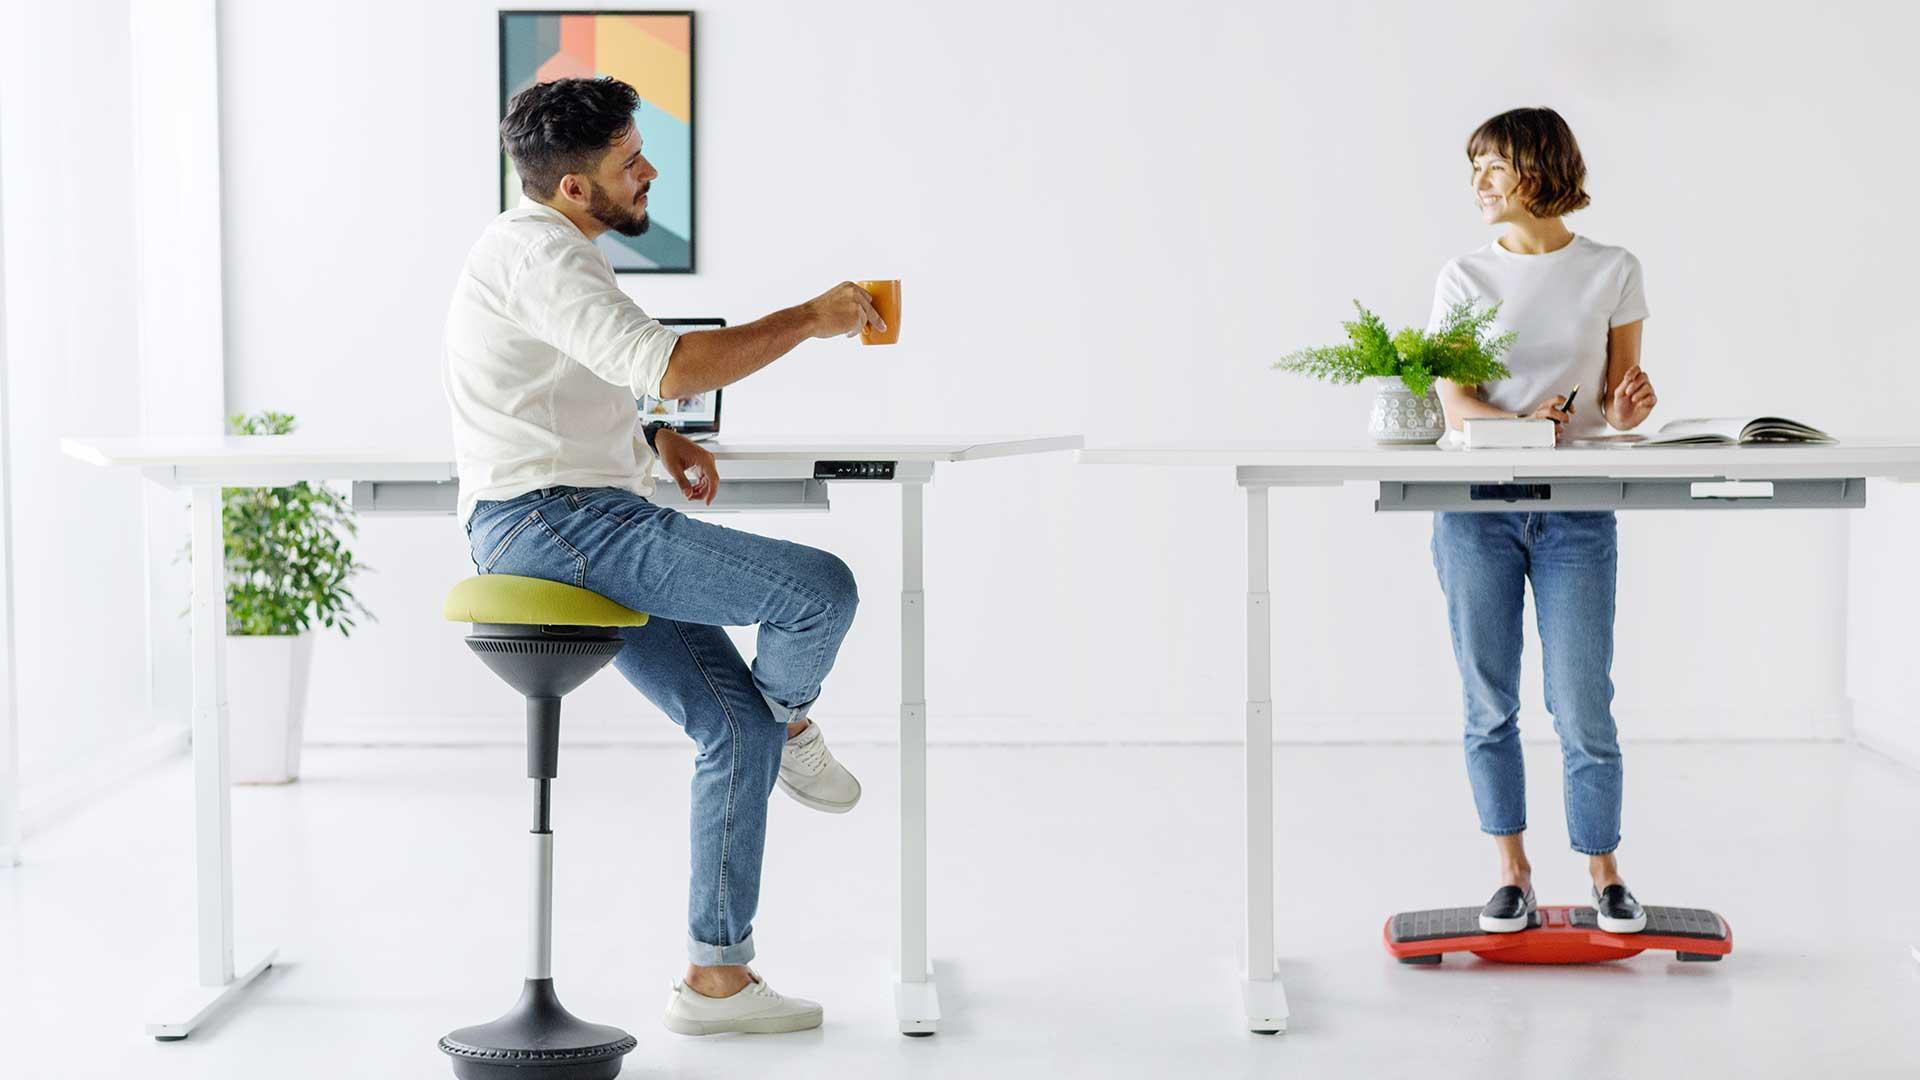 image relates to ergo stool